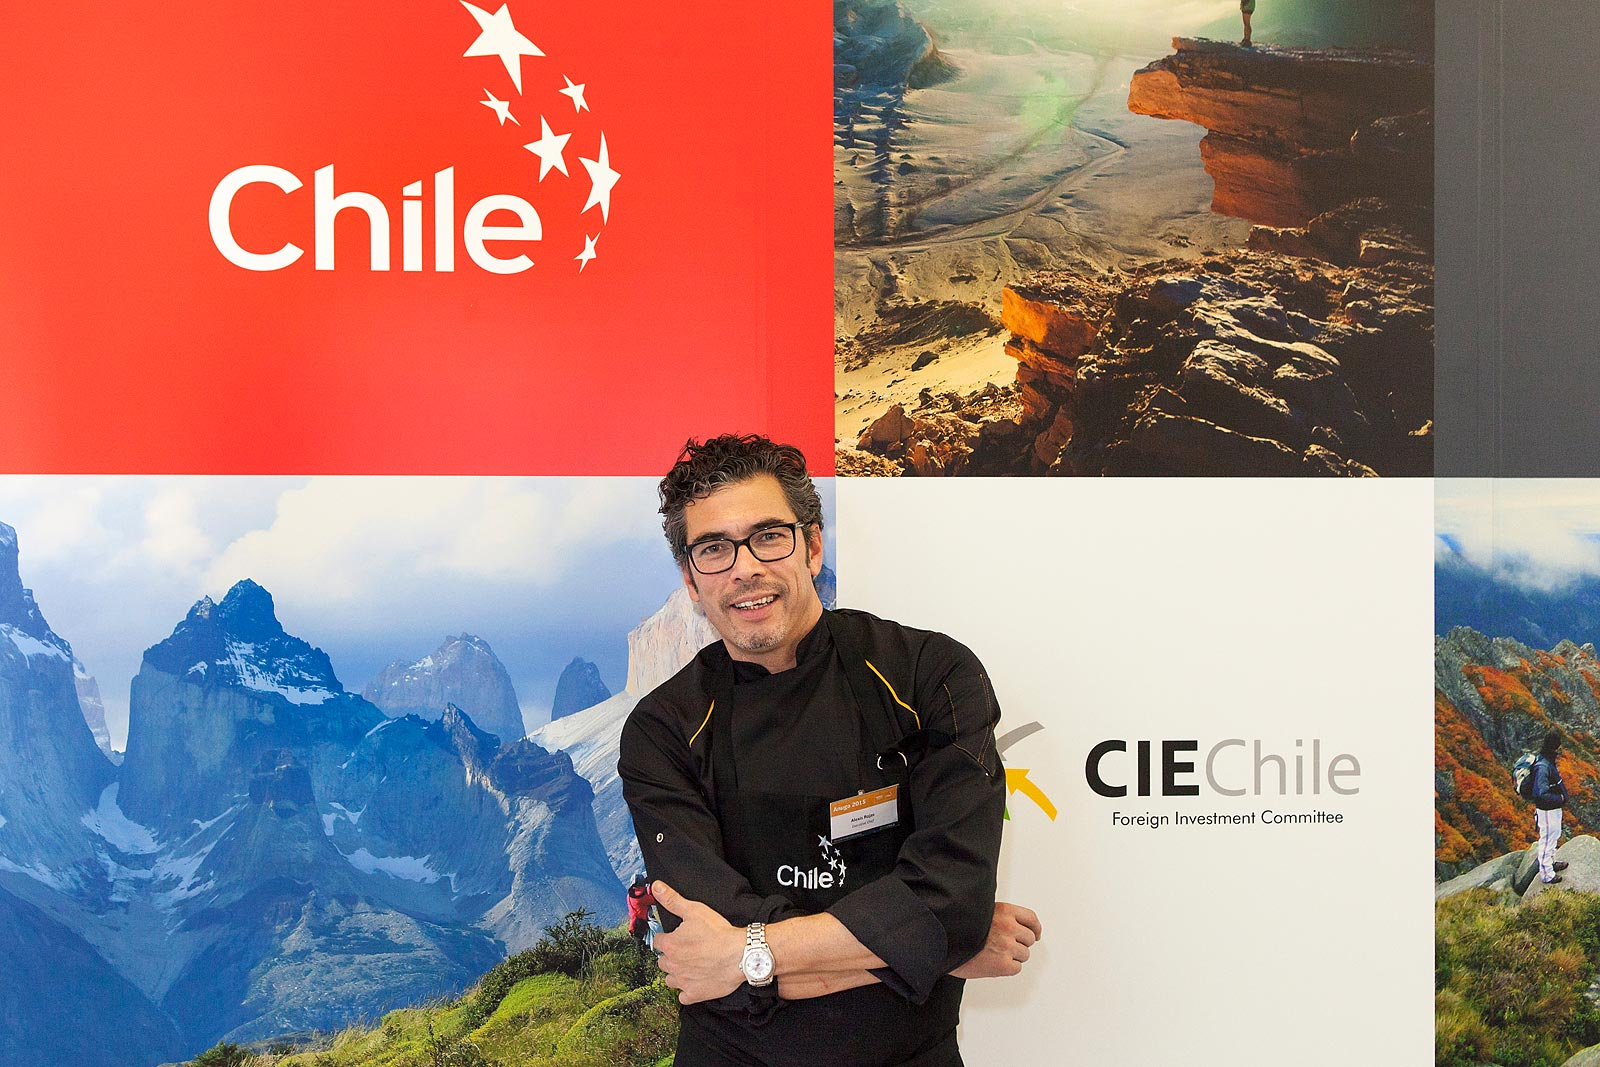 eventfotografie-foods-from-chile-001.jpg